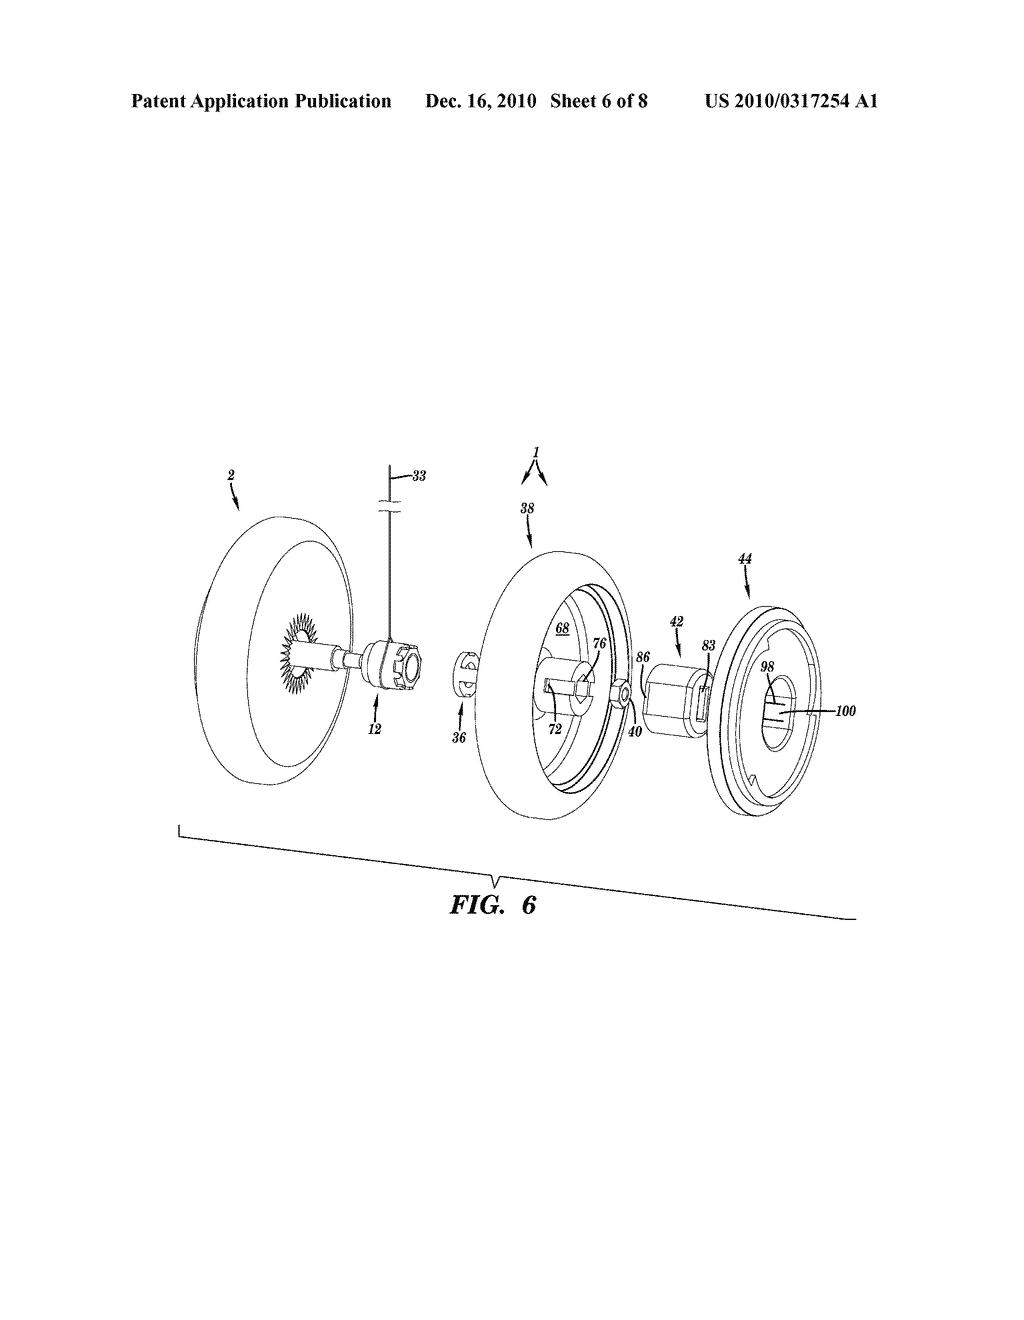 Diagram Of A Push Button Worksheet And Wiring Switch Yo Having Locking Mechanism Schematic Rh Patentsencyclopedia Com